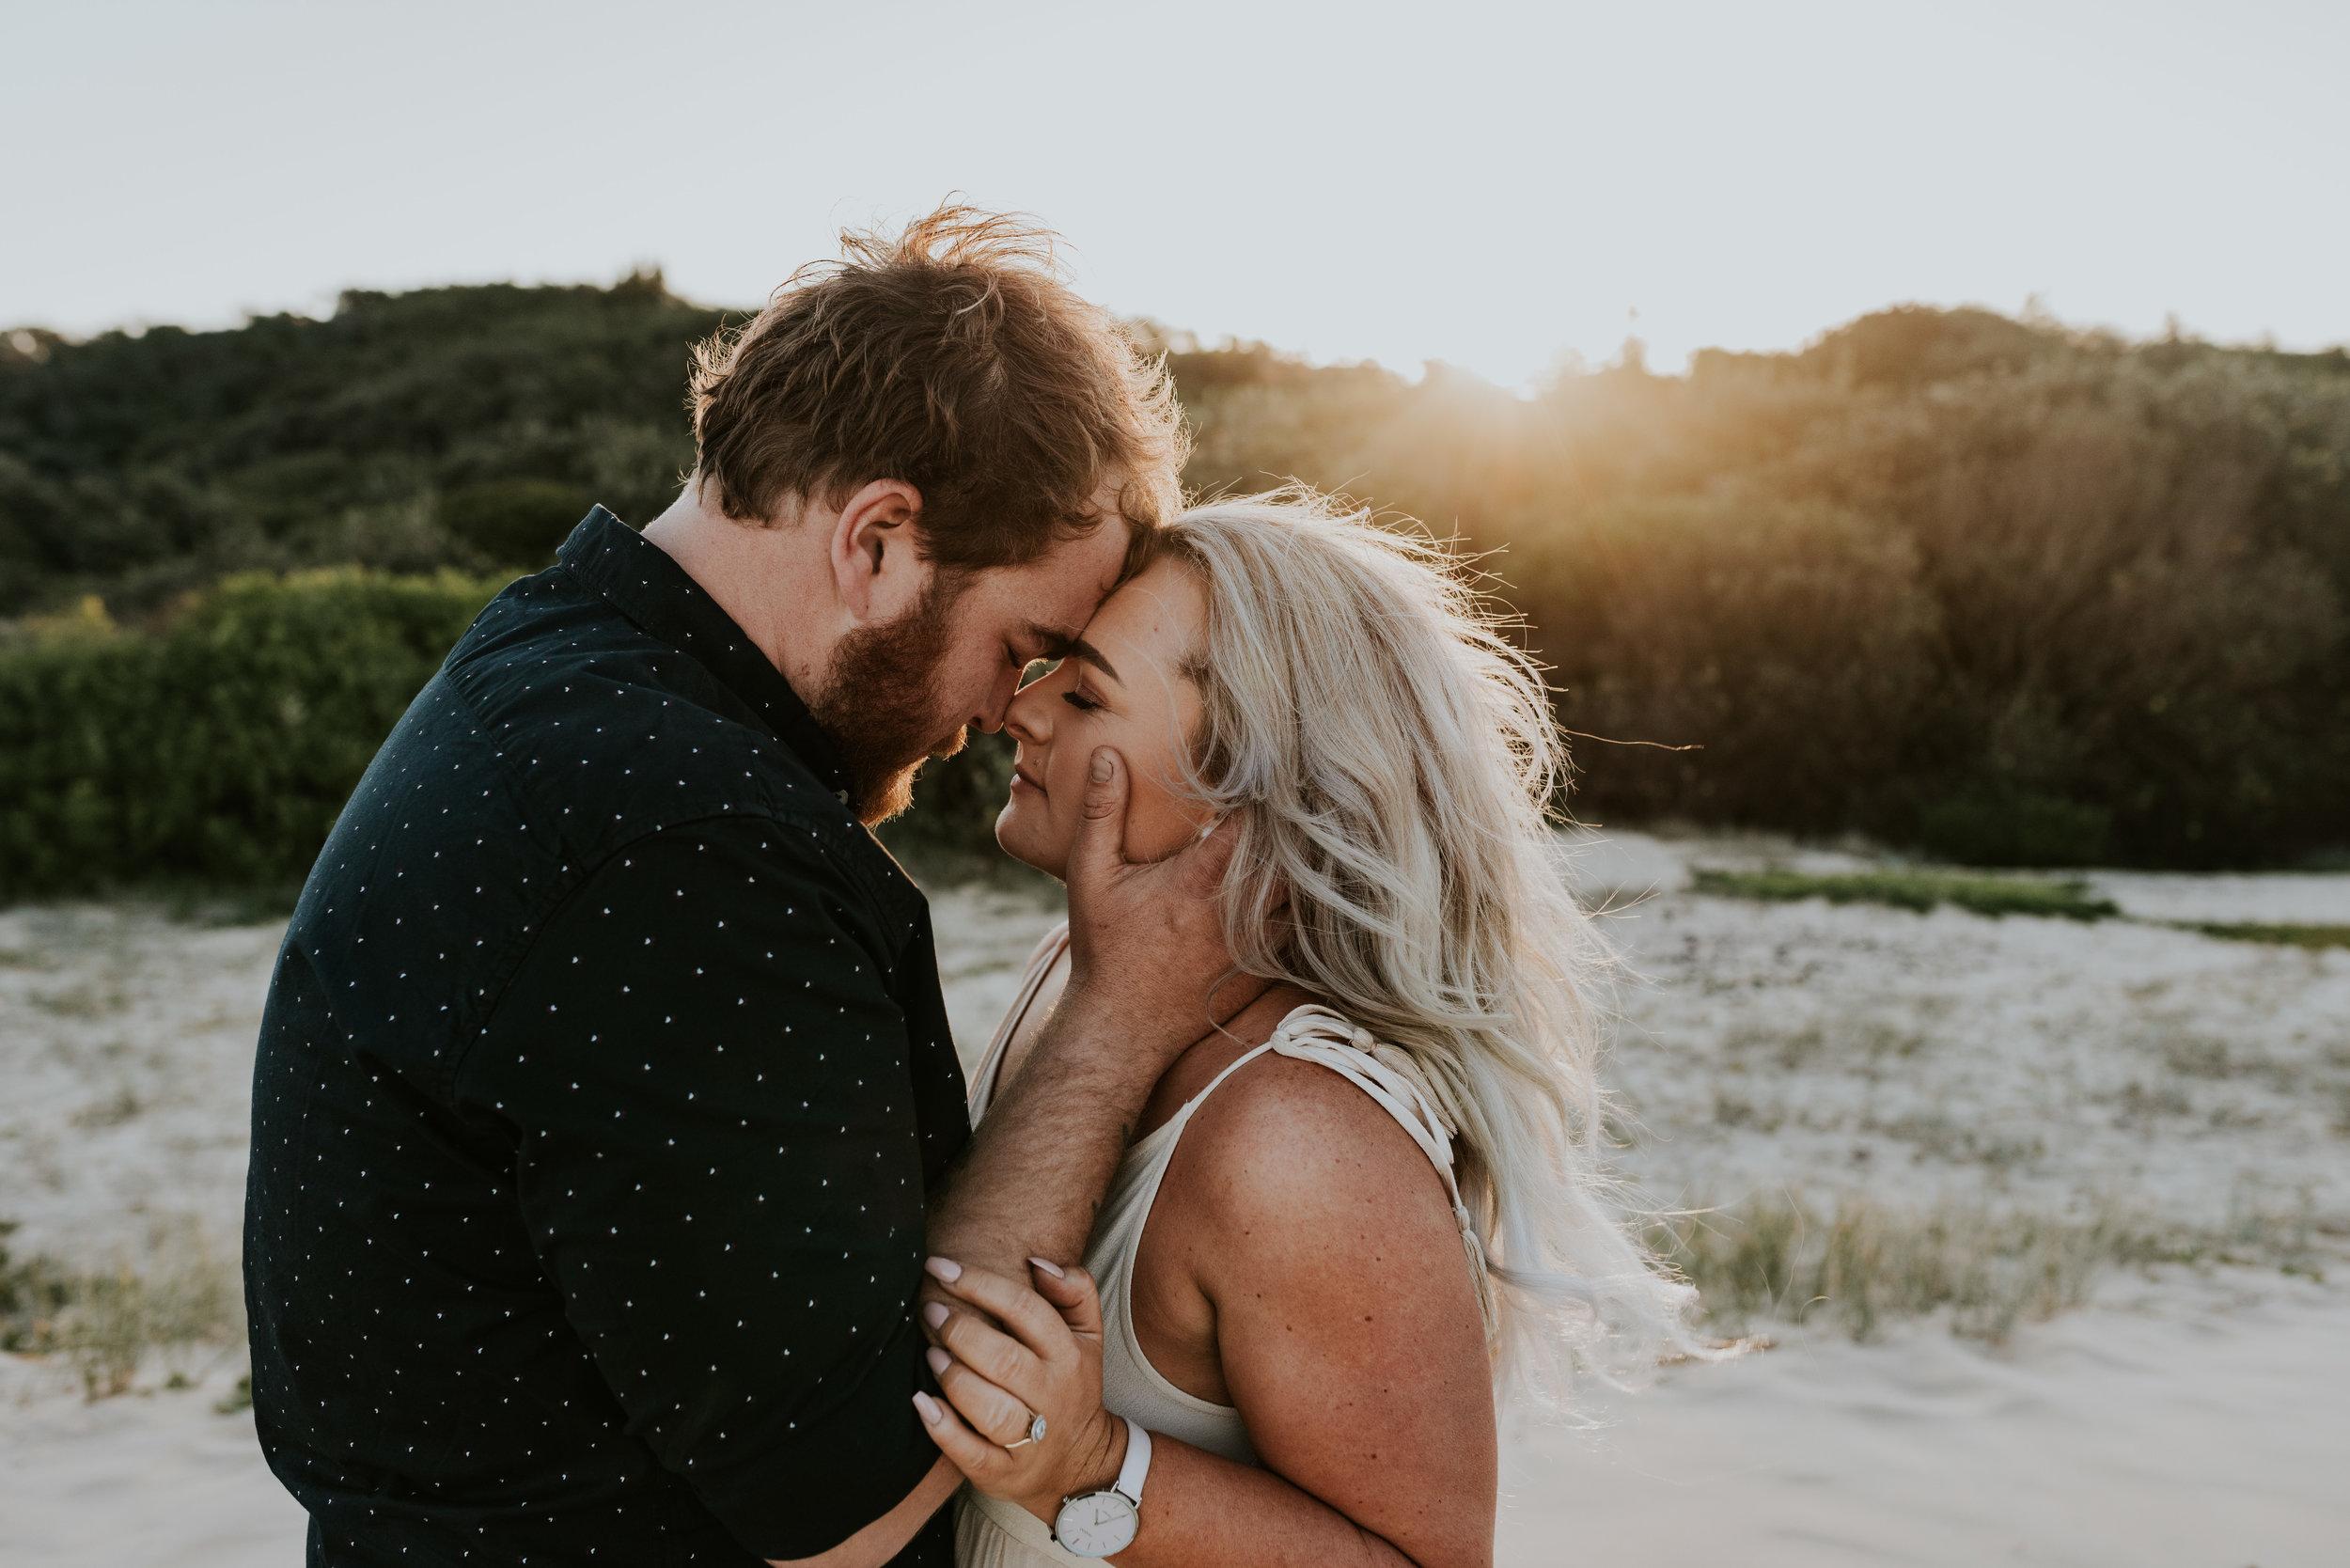 Kynomie & Josh - Redhead Beach, Newcastle Engagement    13th July 2019